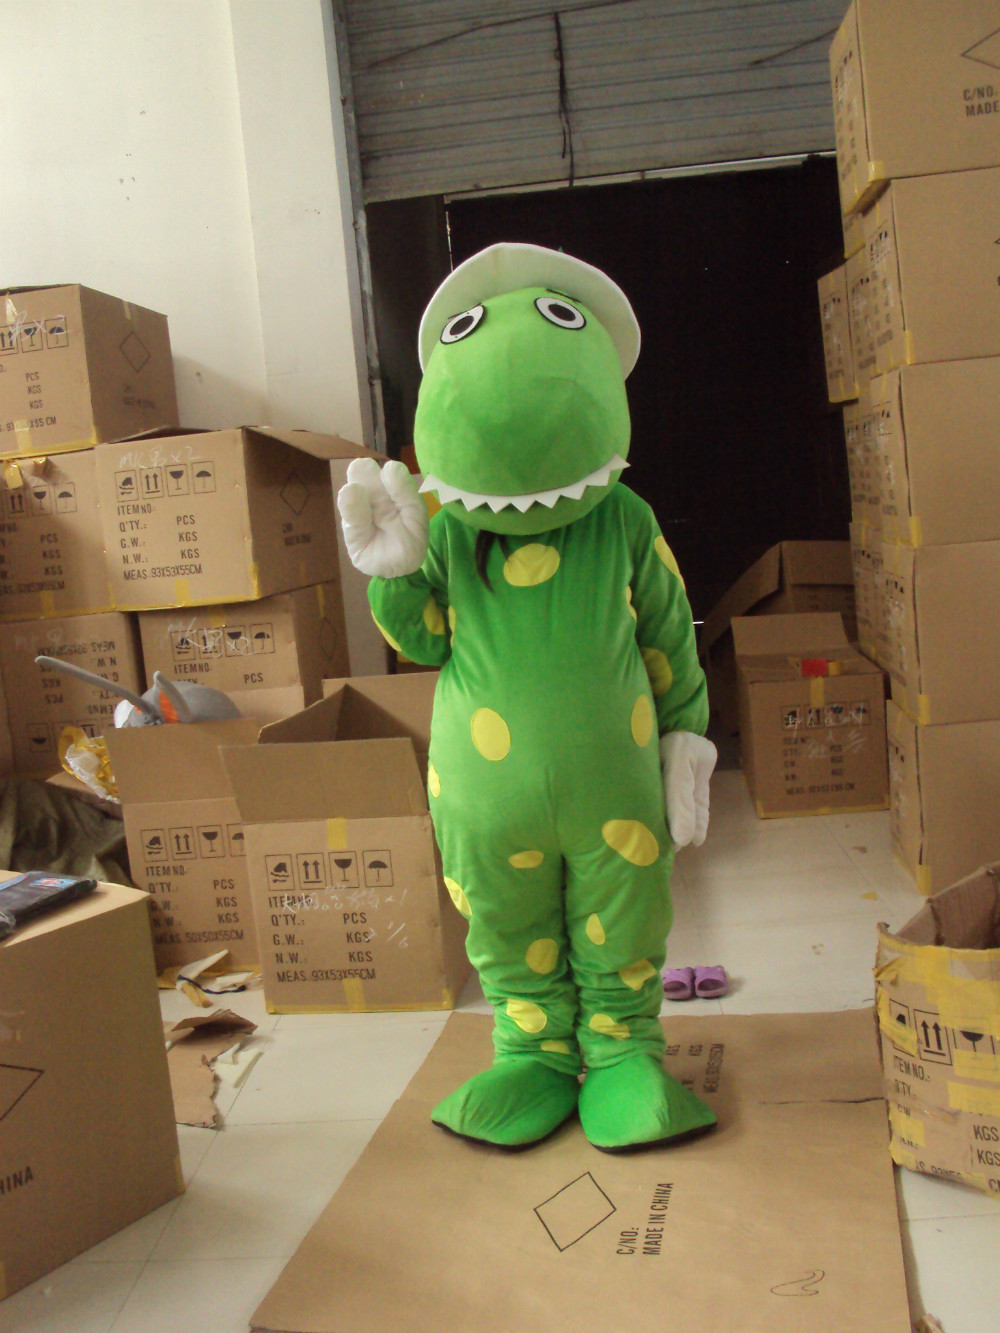 BING RUI CO зеленый дракон, талисман дизайн/дракон костюм талисмана/по индивидуальному заказу костюм дракона мех Динозавр талисман костюм для в